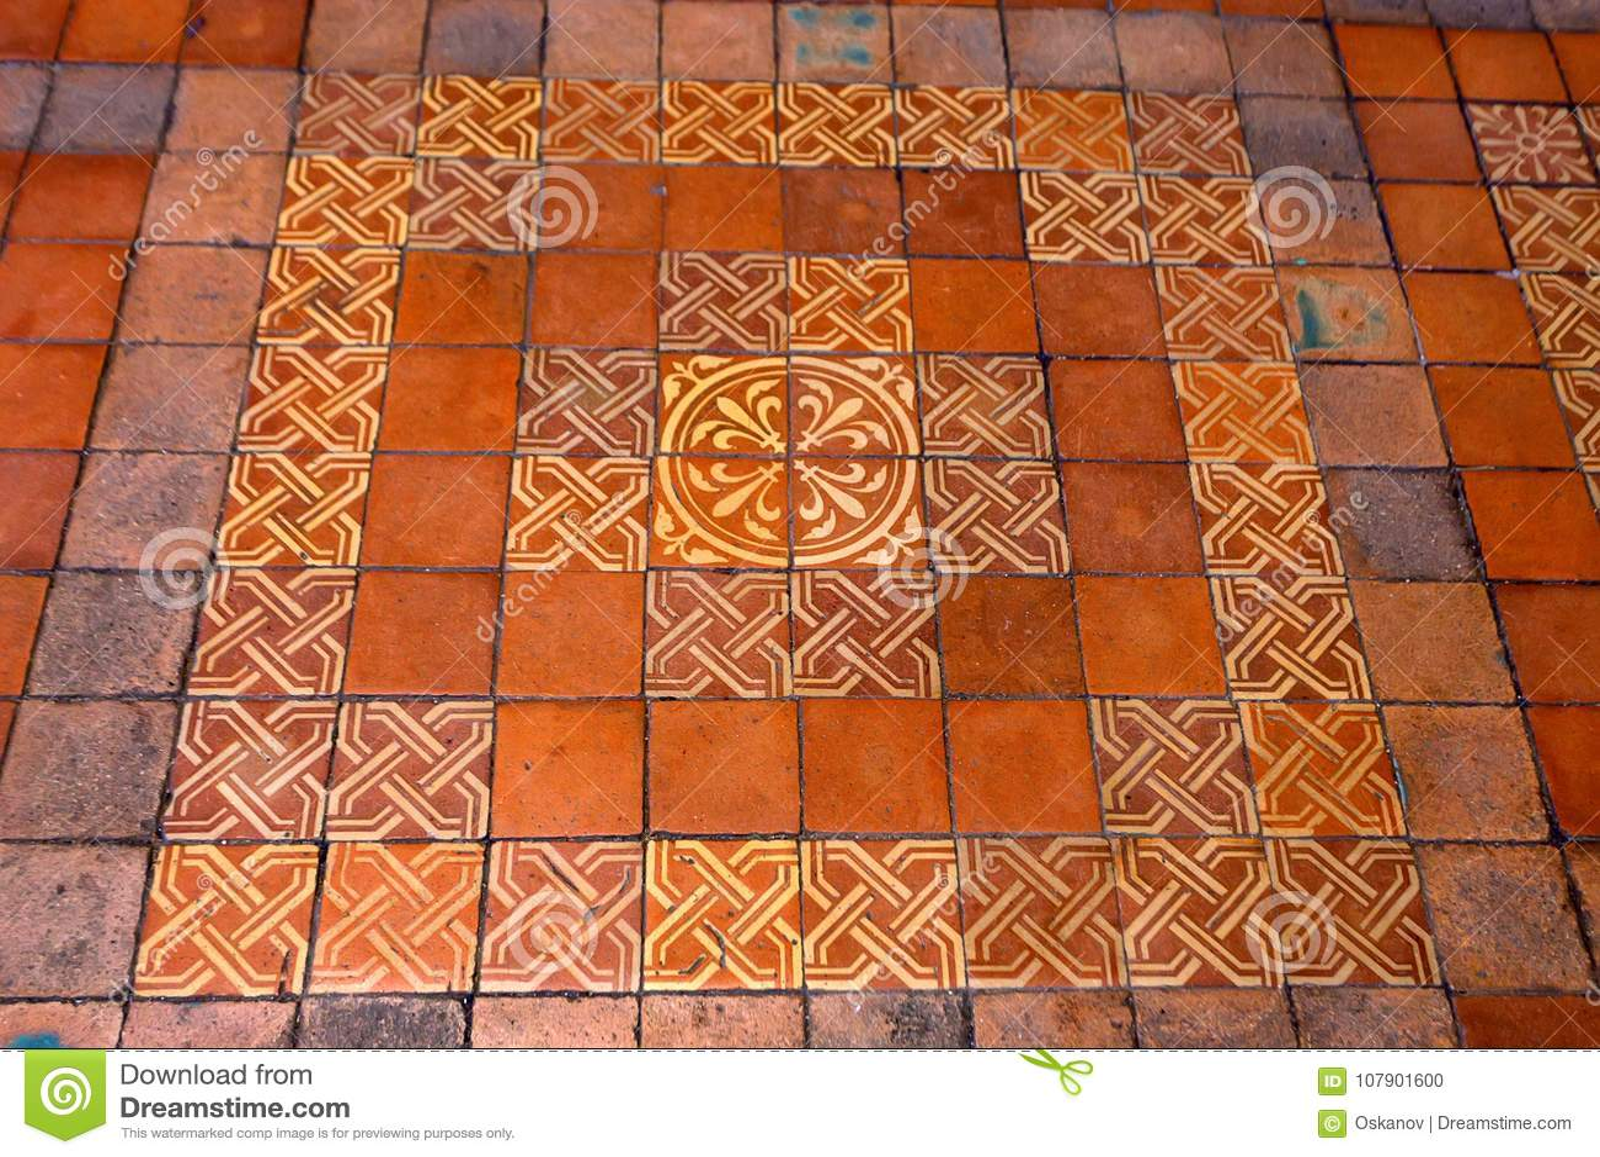 https www dreamstime com blois france circa june decorative floor tile french castle close up beautiful orange used medieval chateau de image107901600